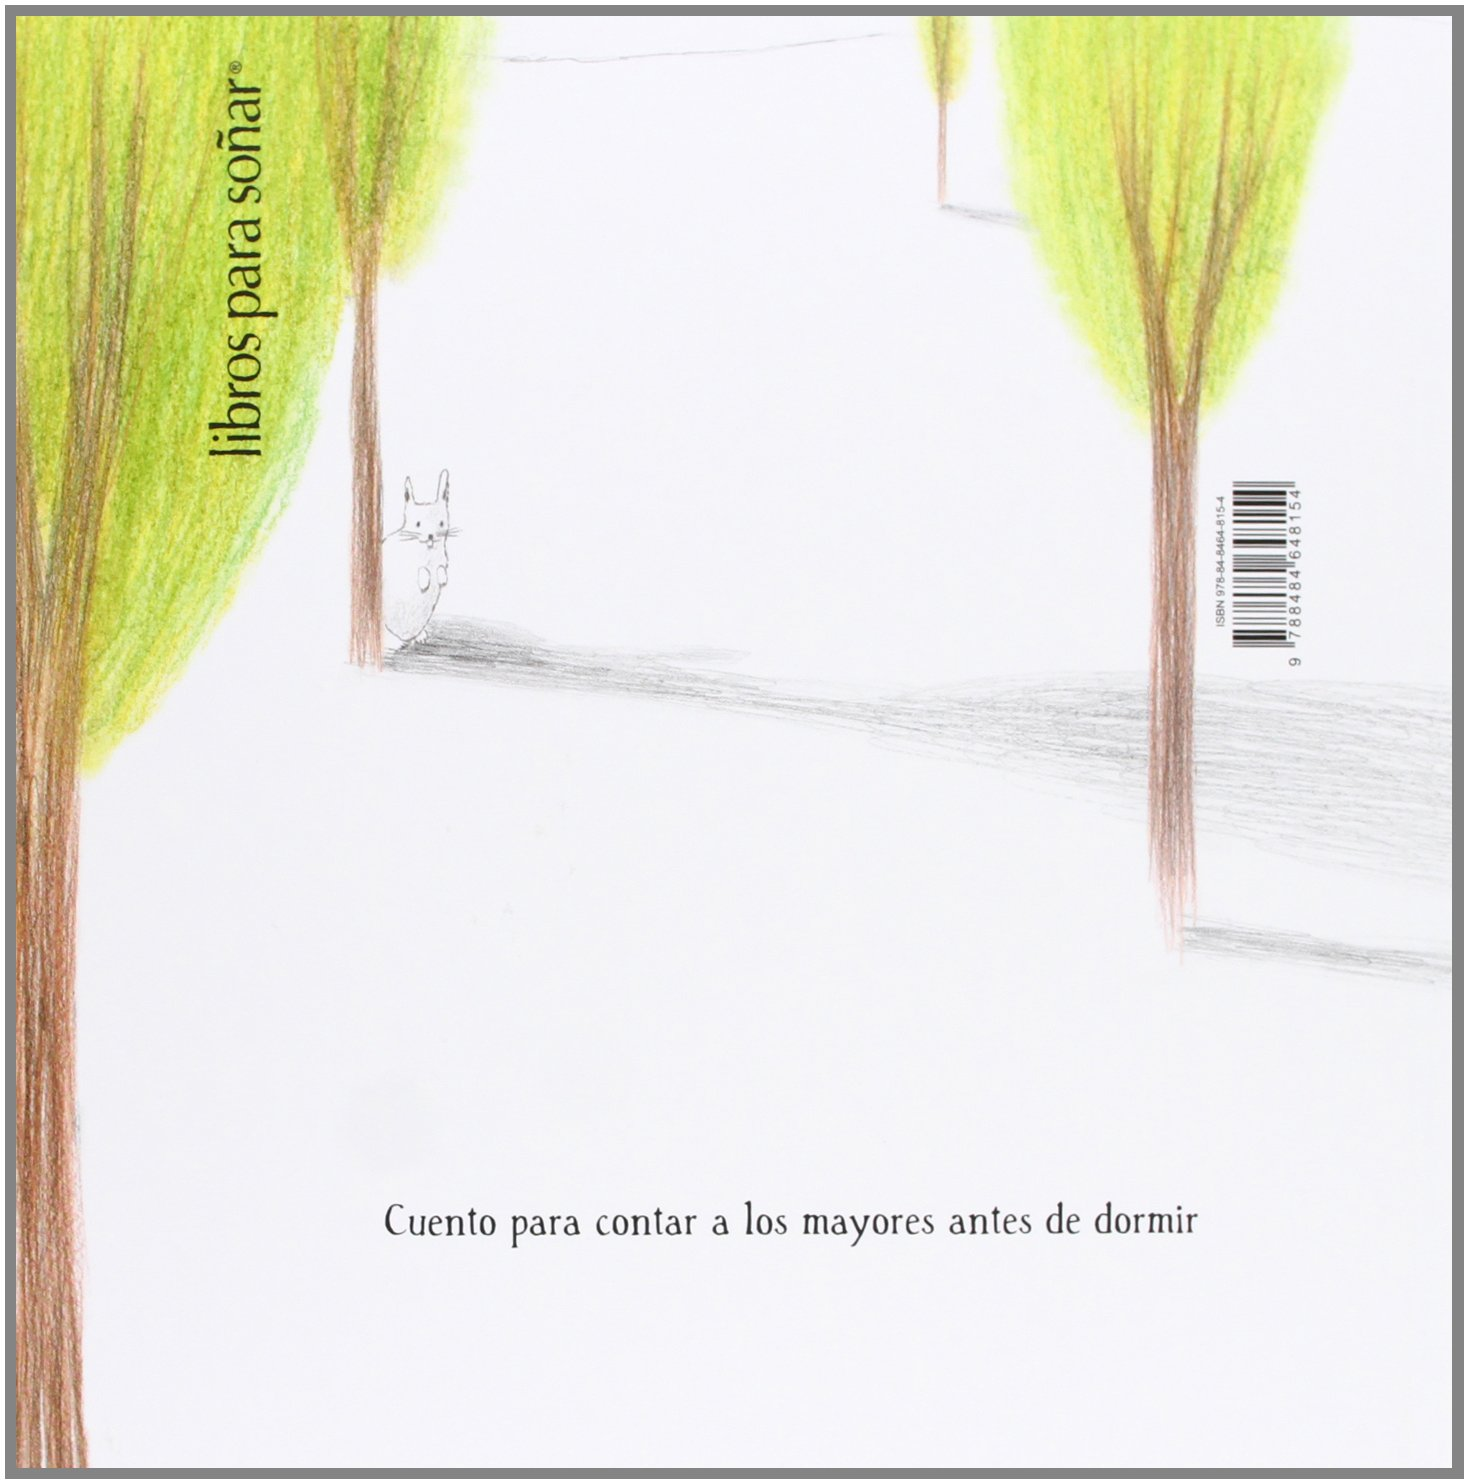 Cuando os hagáis pequeños (libros para soñar): Amazon.es: Uxue Alberdi,  Aitziber Akerreta: Libros